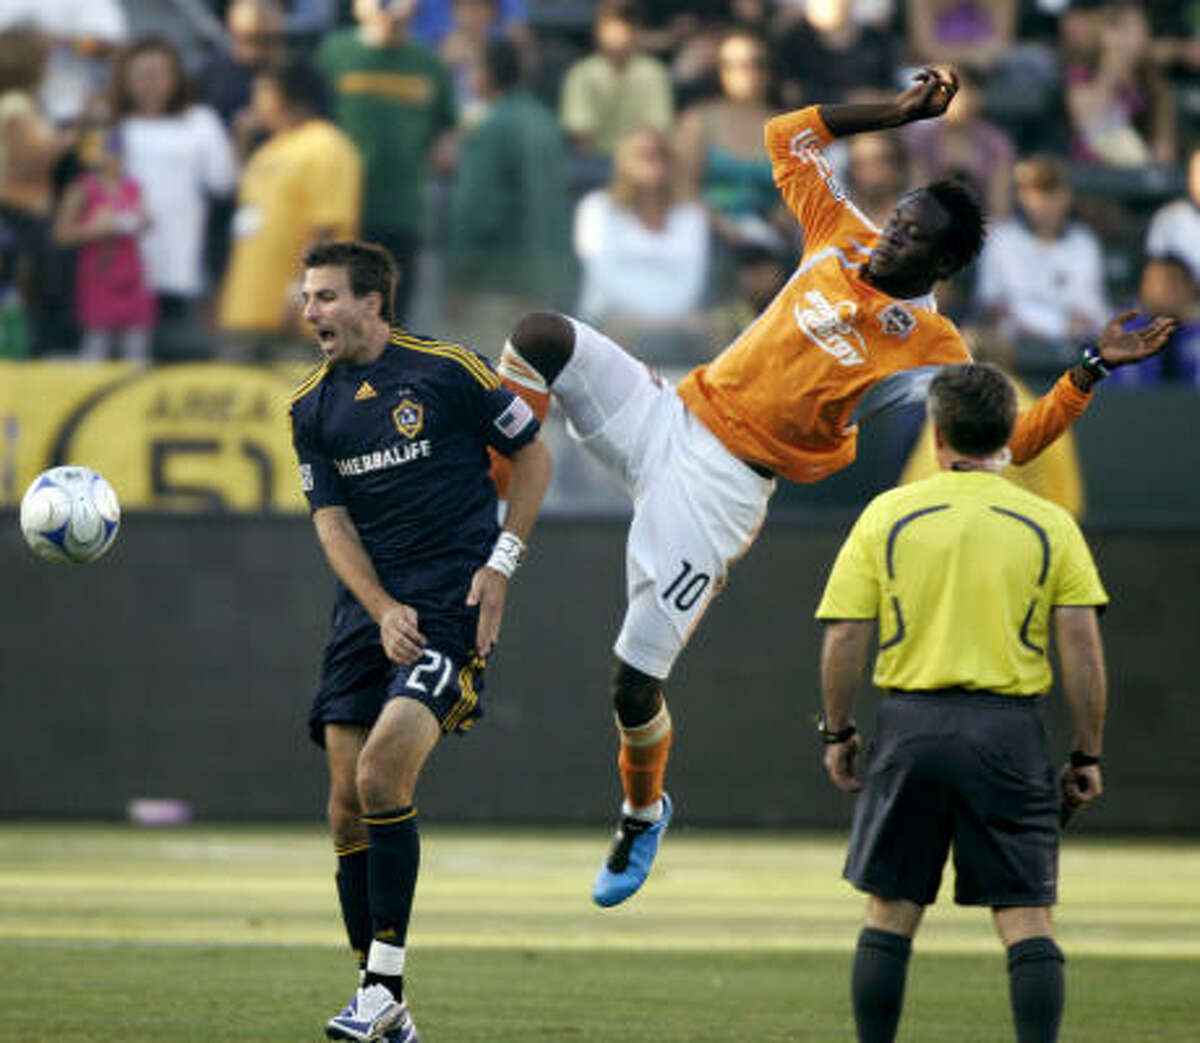 The Dynamo's Kei Kamara (10) is shielded from the ball by the Galaxy's Alan Gordon (21).